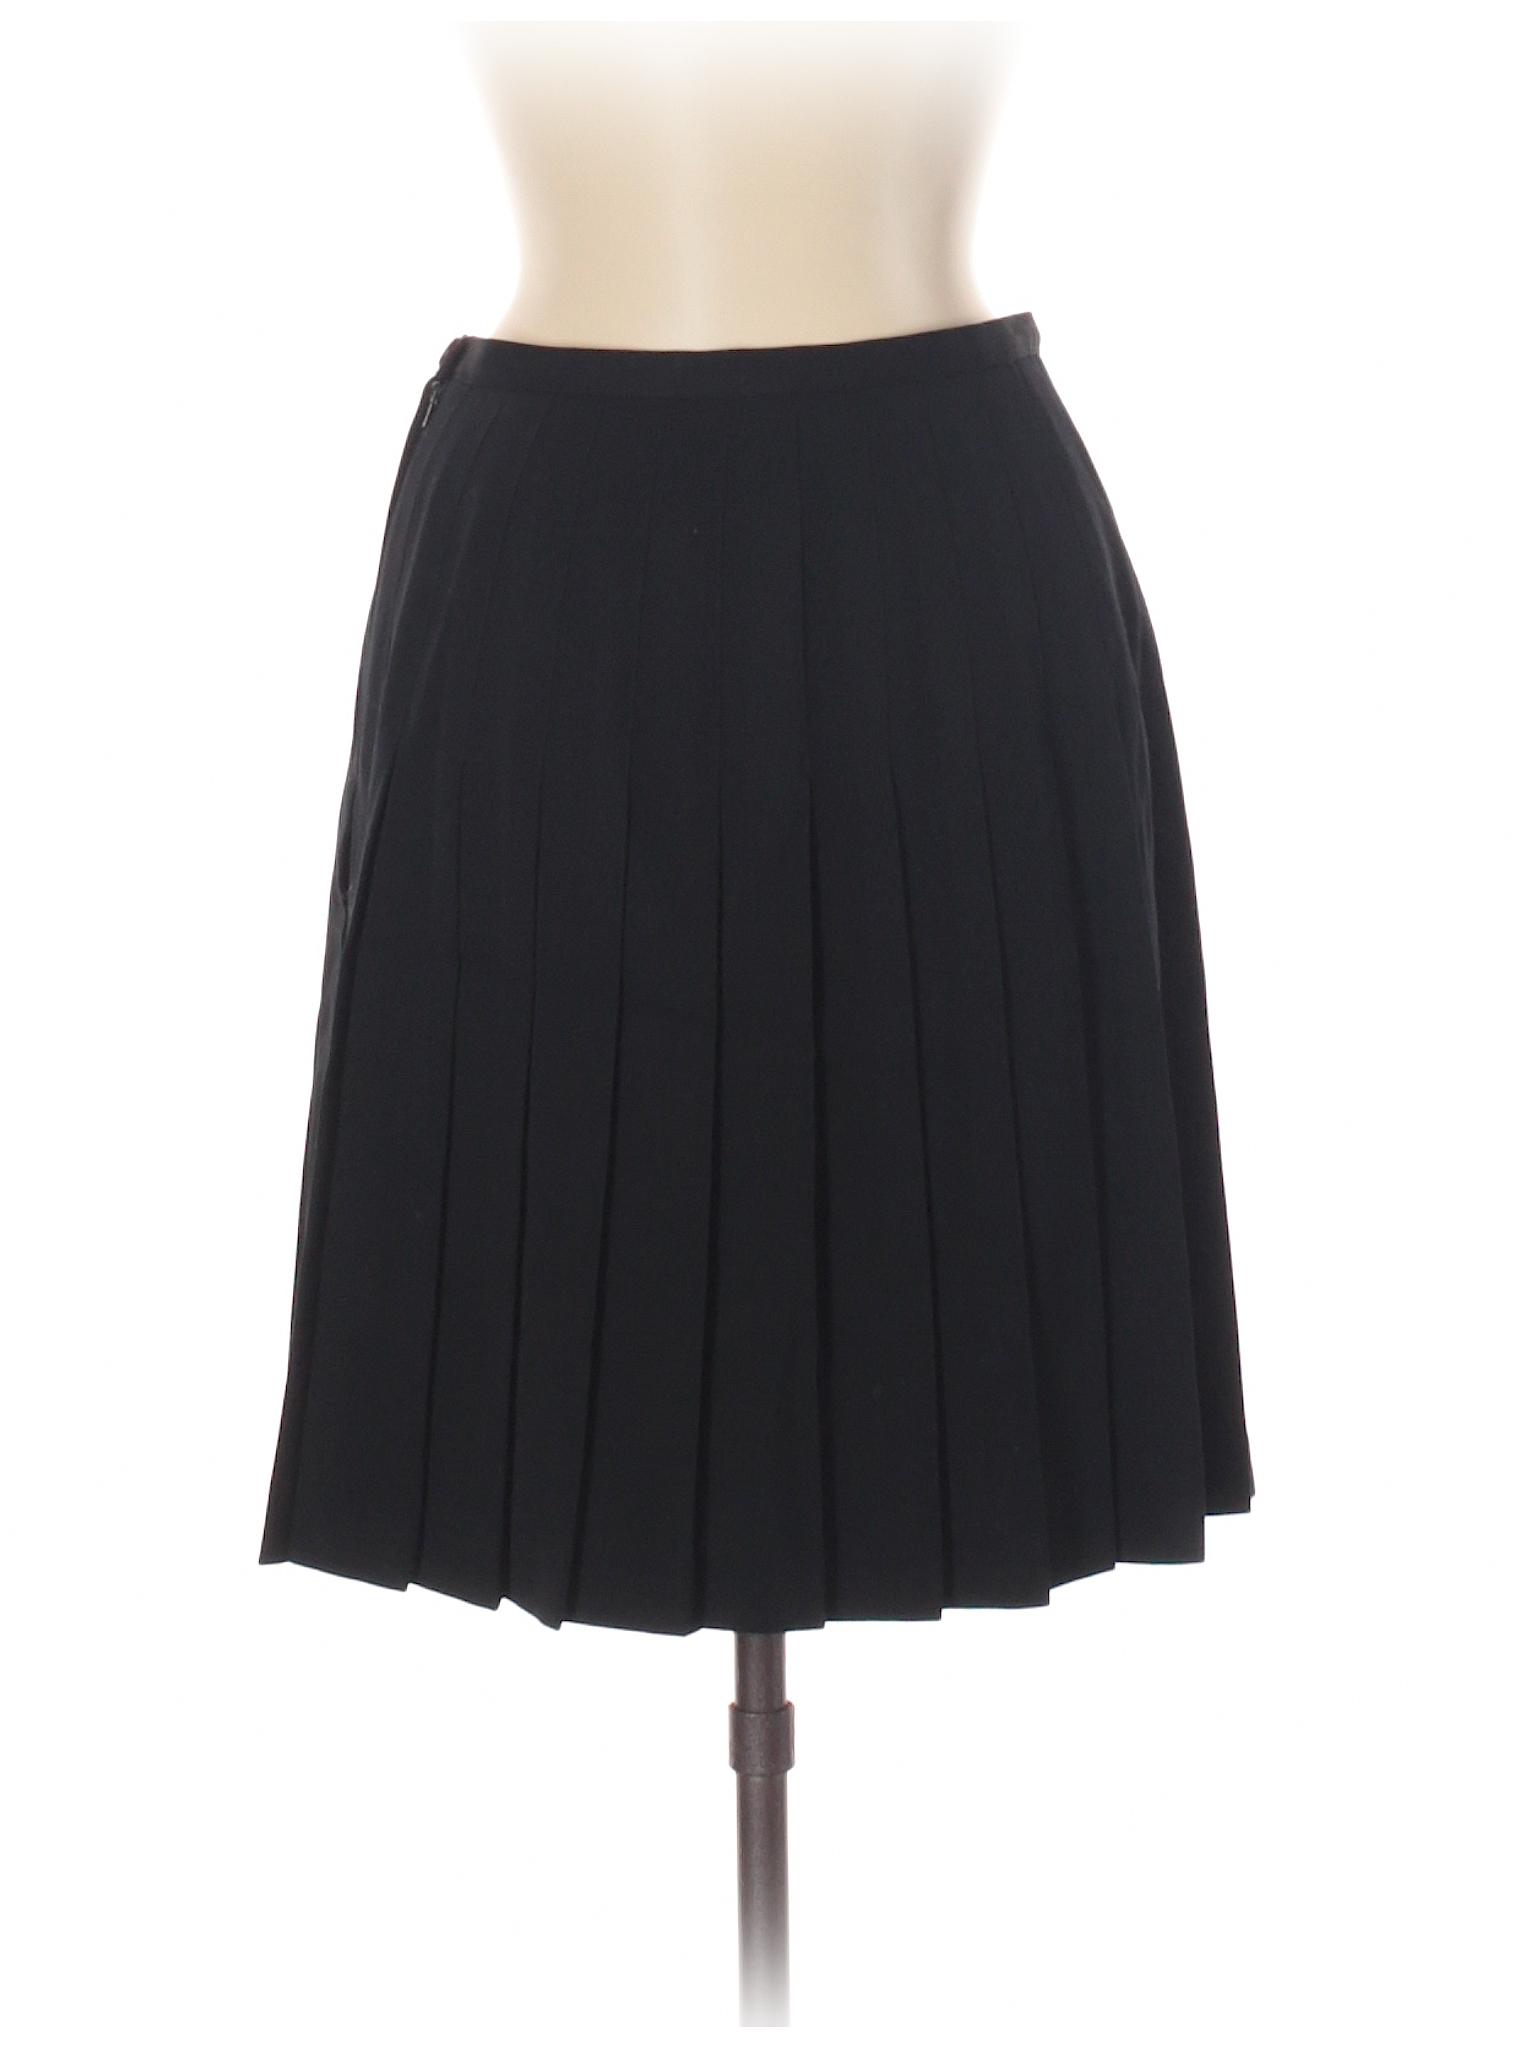 Boutique Boutique Boutique Skirt Wool Skirt Wool Boutique Wool Wool Skirt vwBrqv